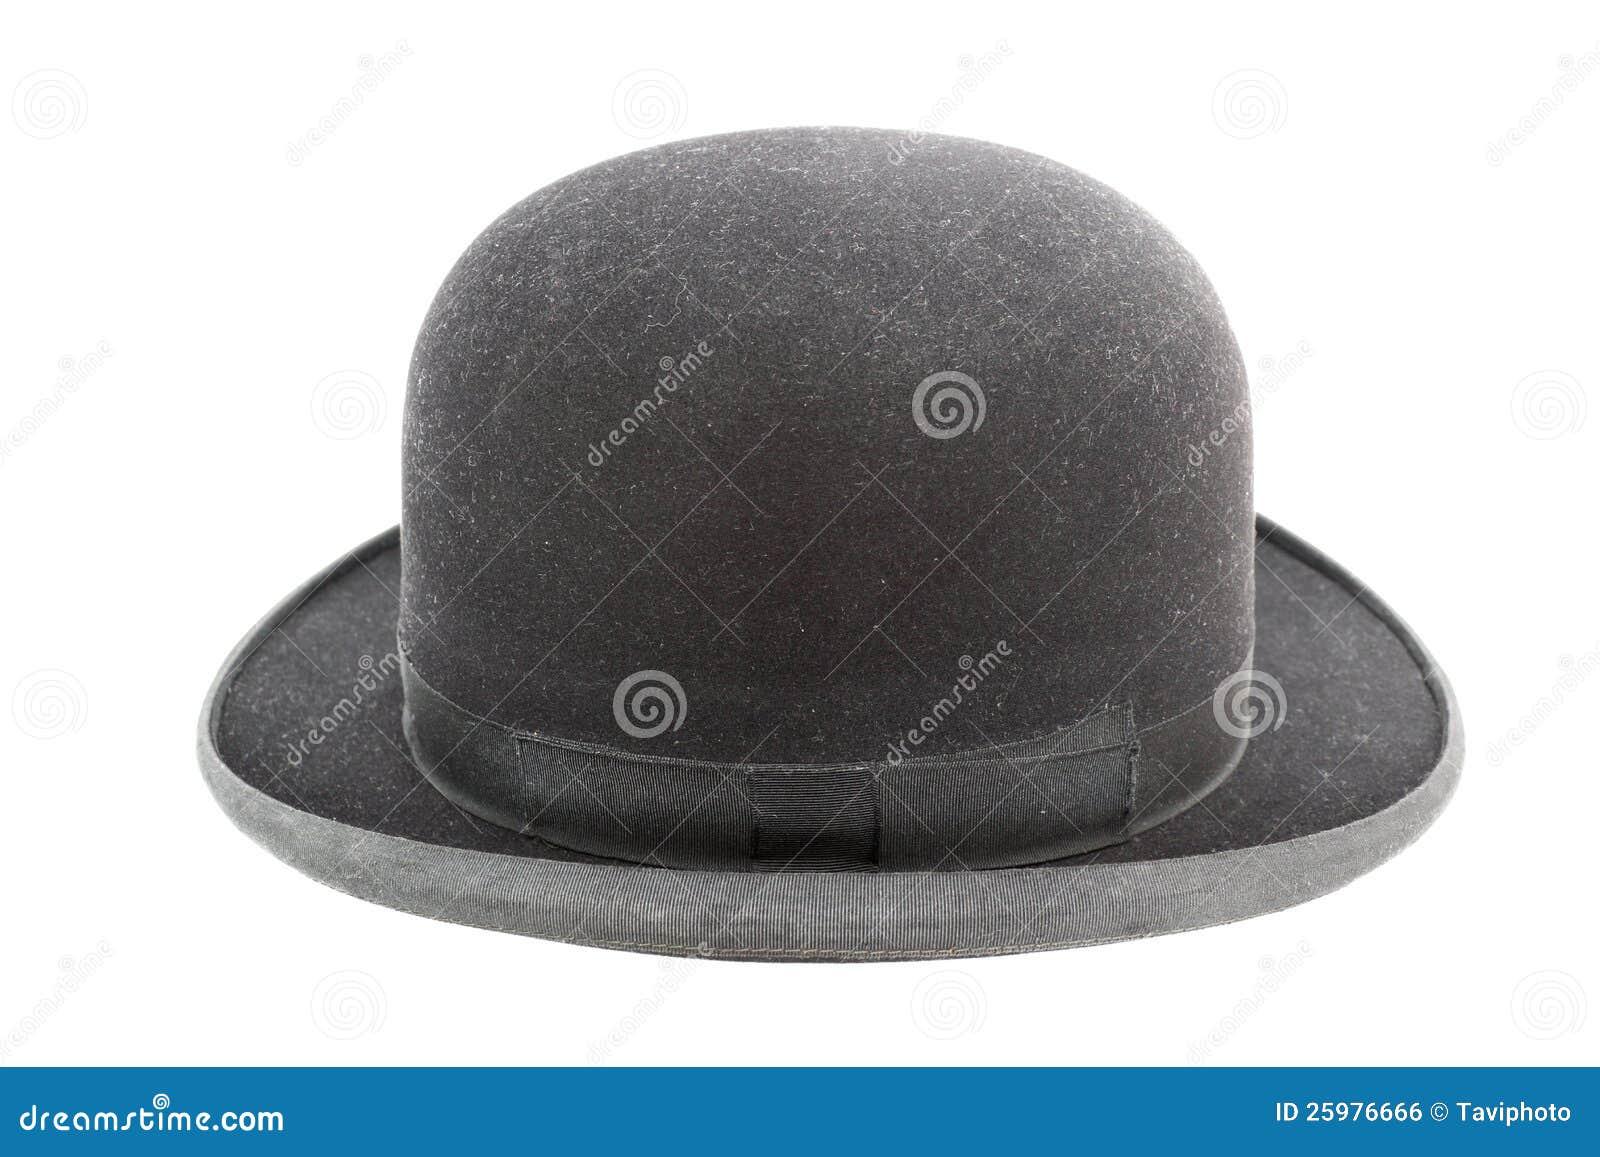 Old Hat Stock Photo. Image Of Elegance, Clothing, Closeup